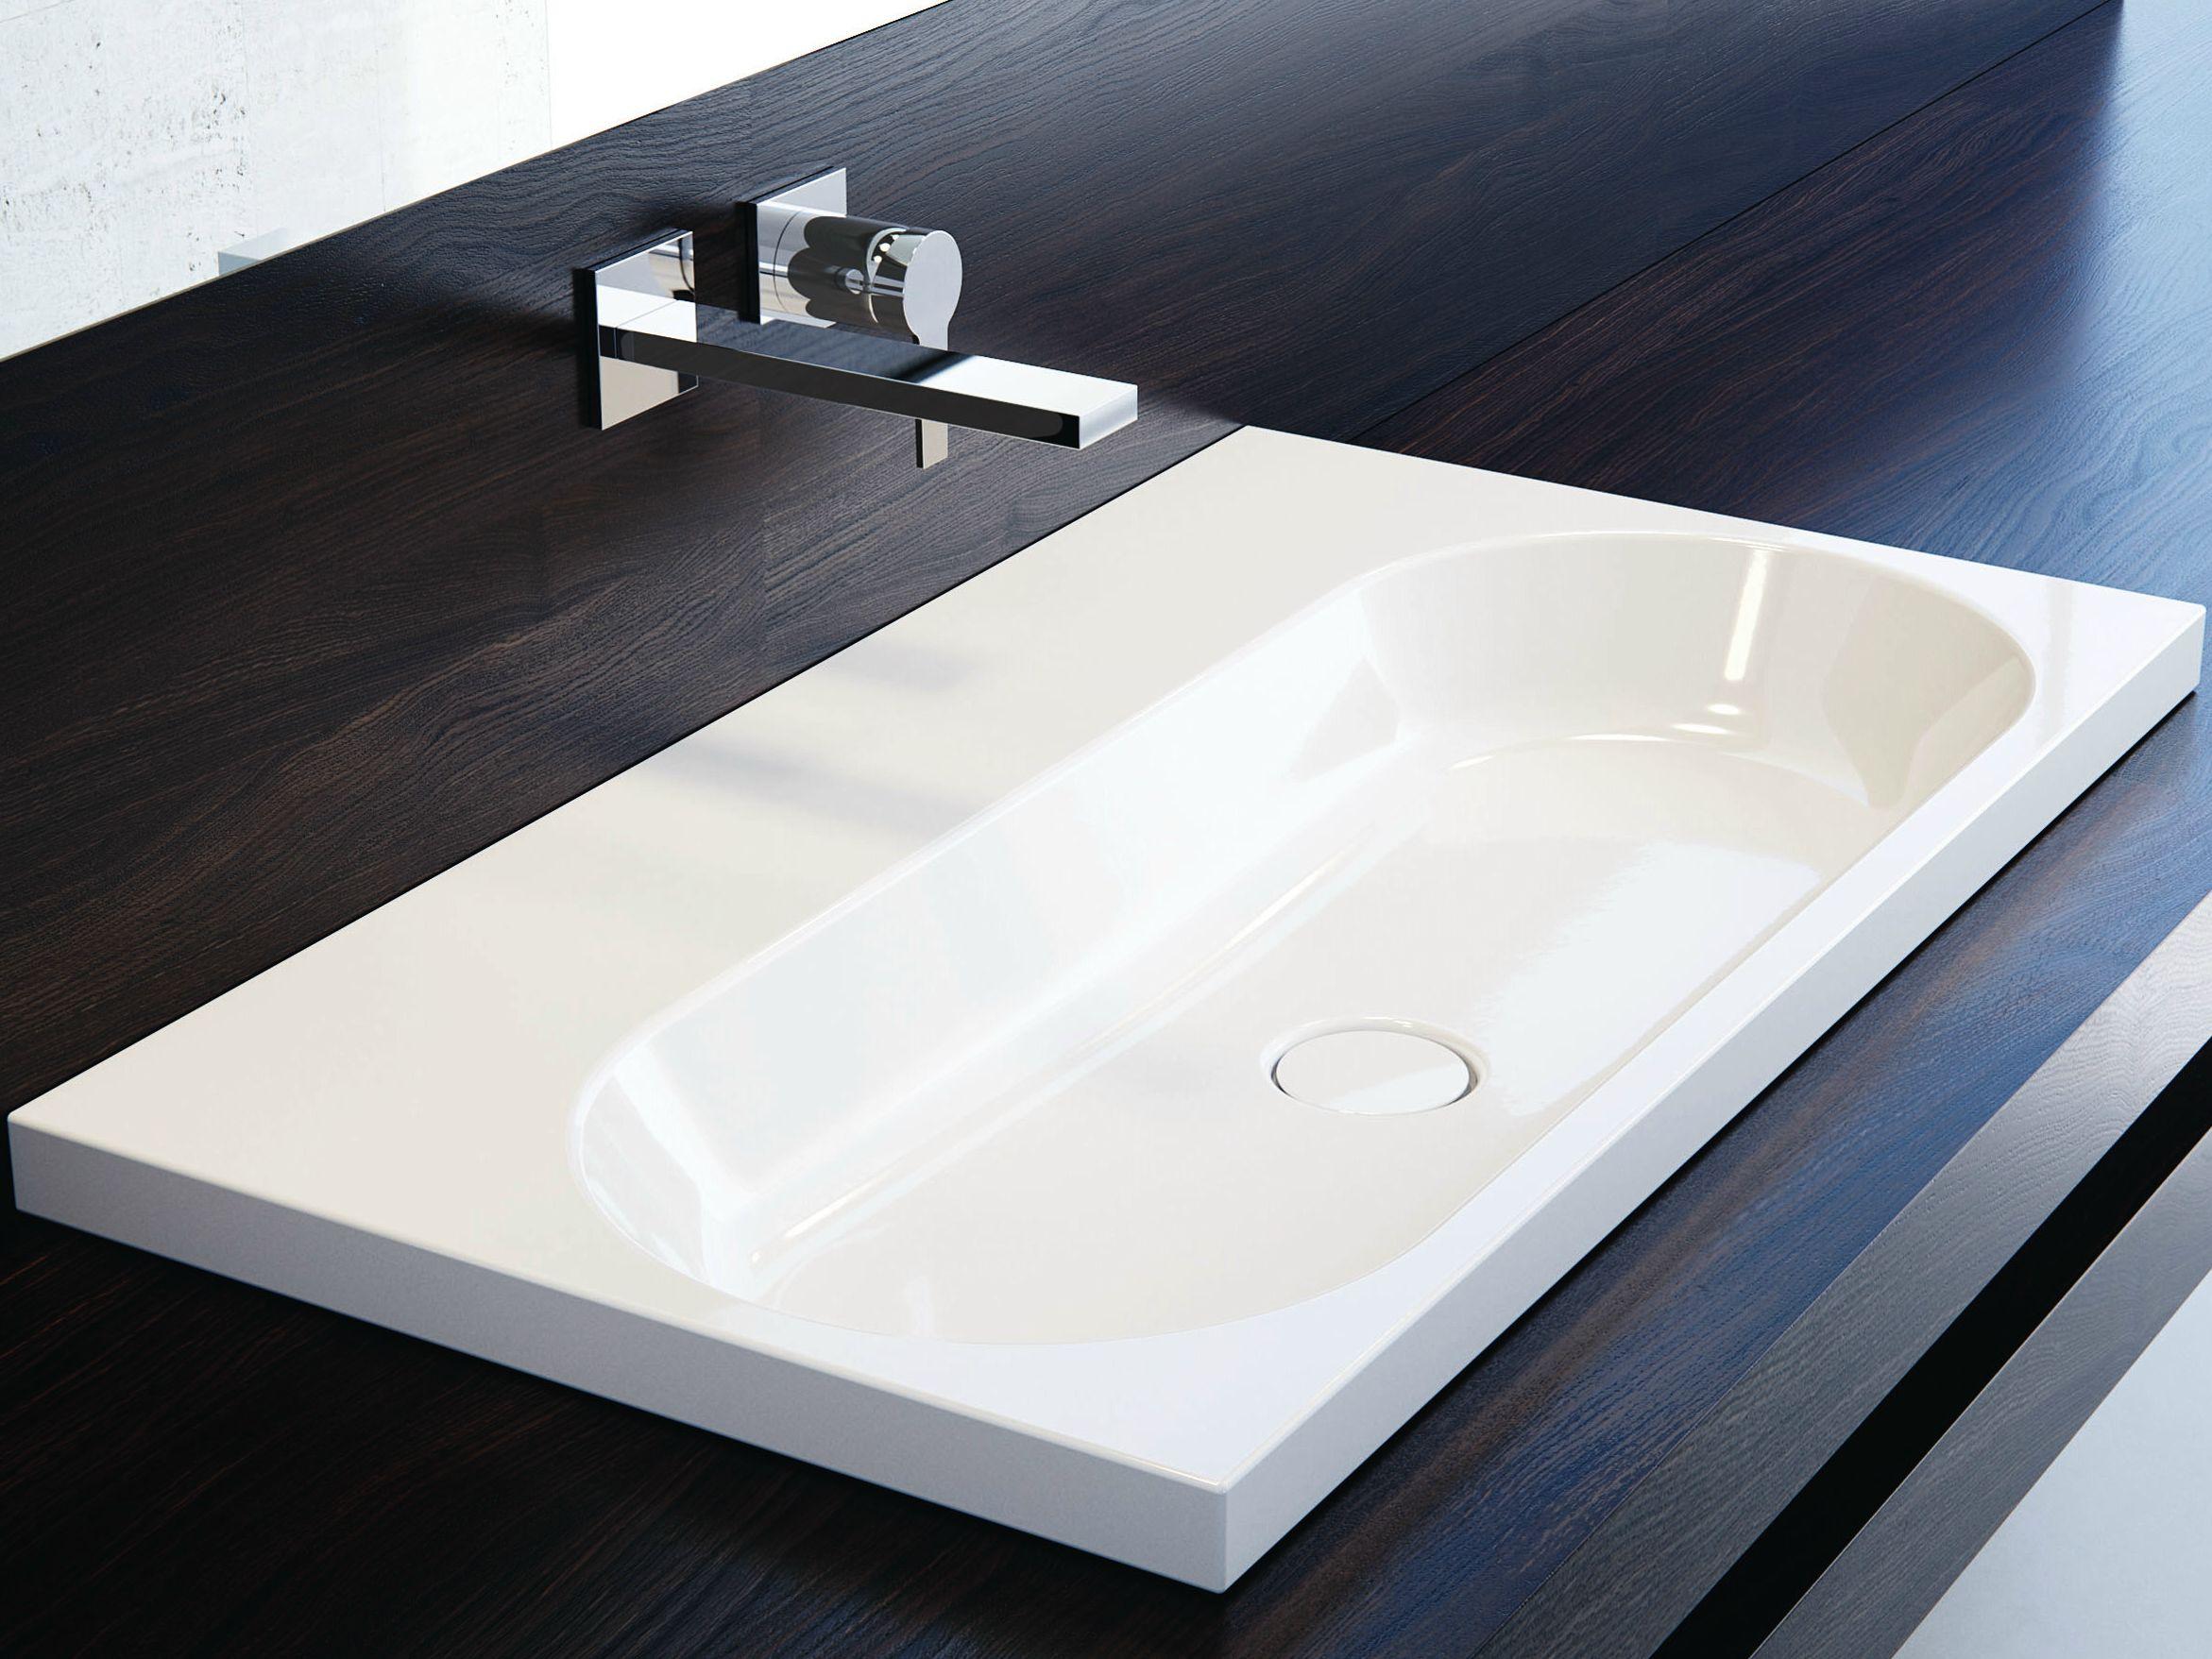 vasque encastrer rectangulaire en acier maill centro. Black Bedroom Furniture Sets. Home Design Ideas